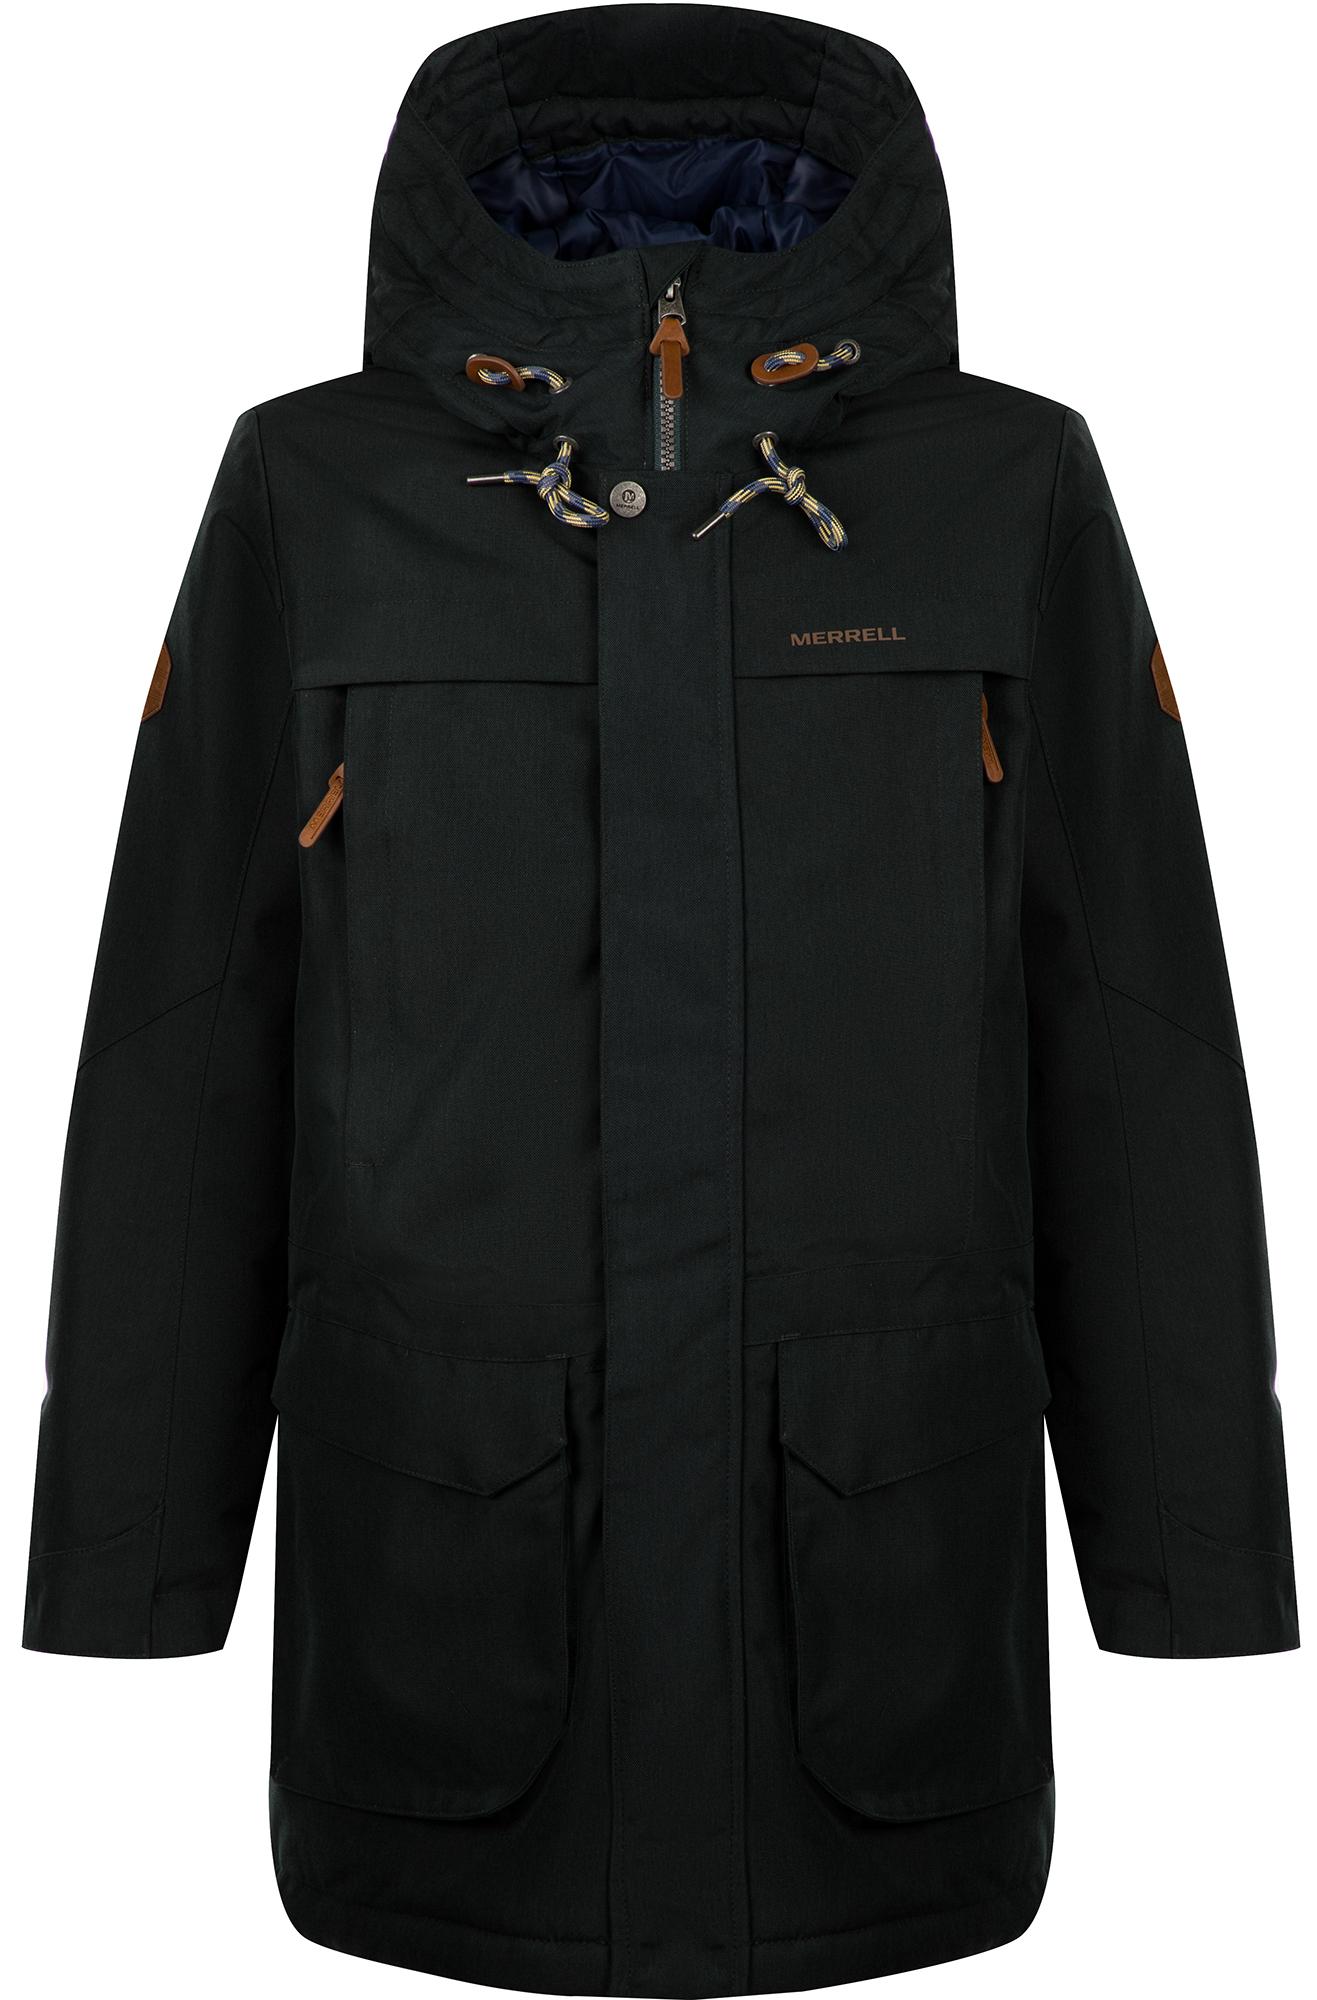 Merrell Куртка утепленная для мальчиков Merrell, размер 176 куртка хольстер утепленная смес ткань 48 50 170 176 лес 2010